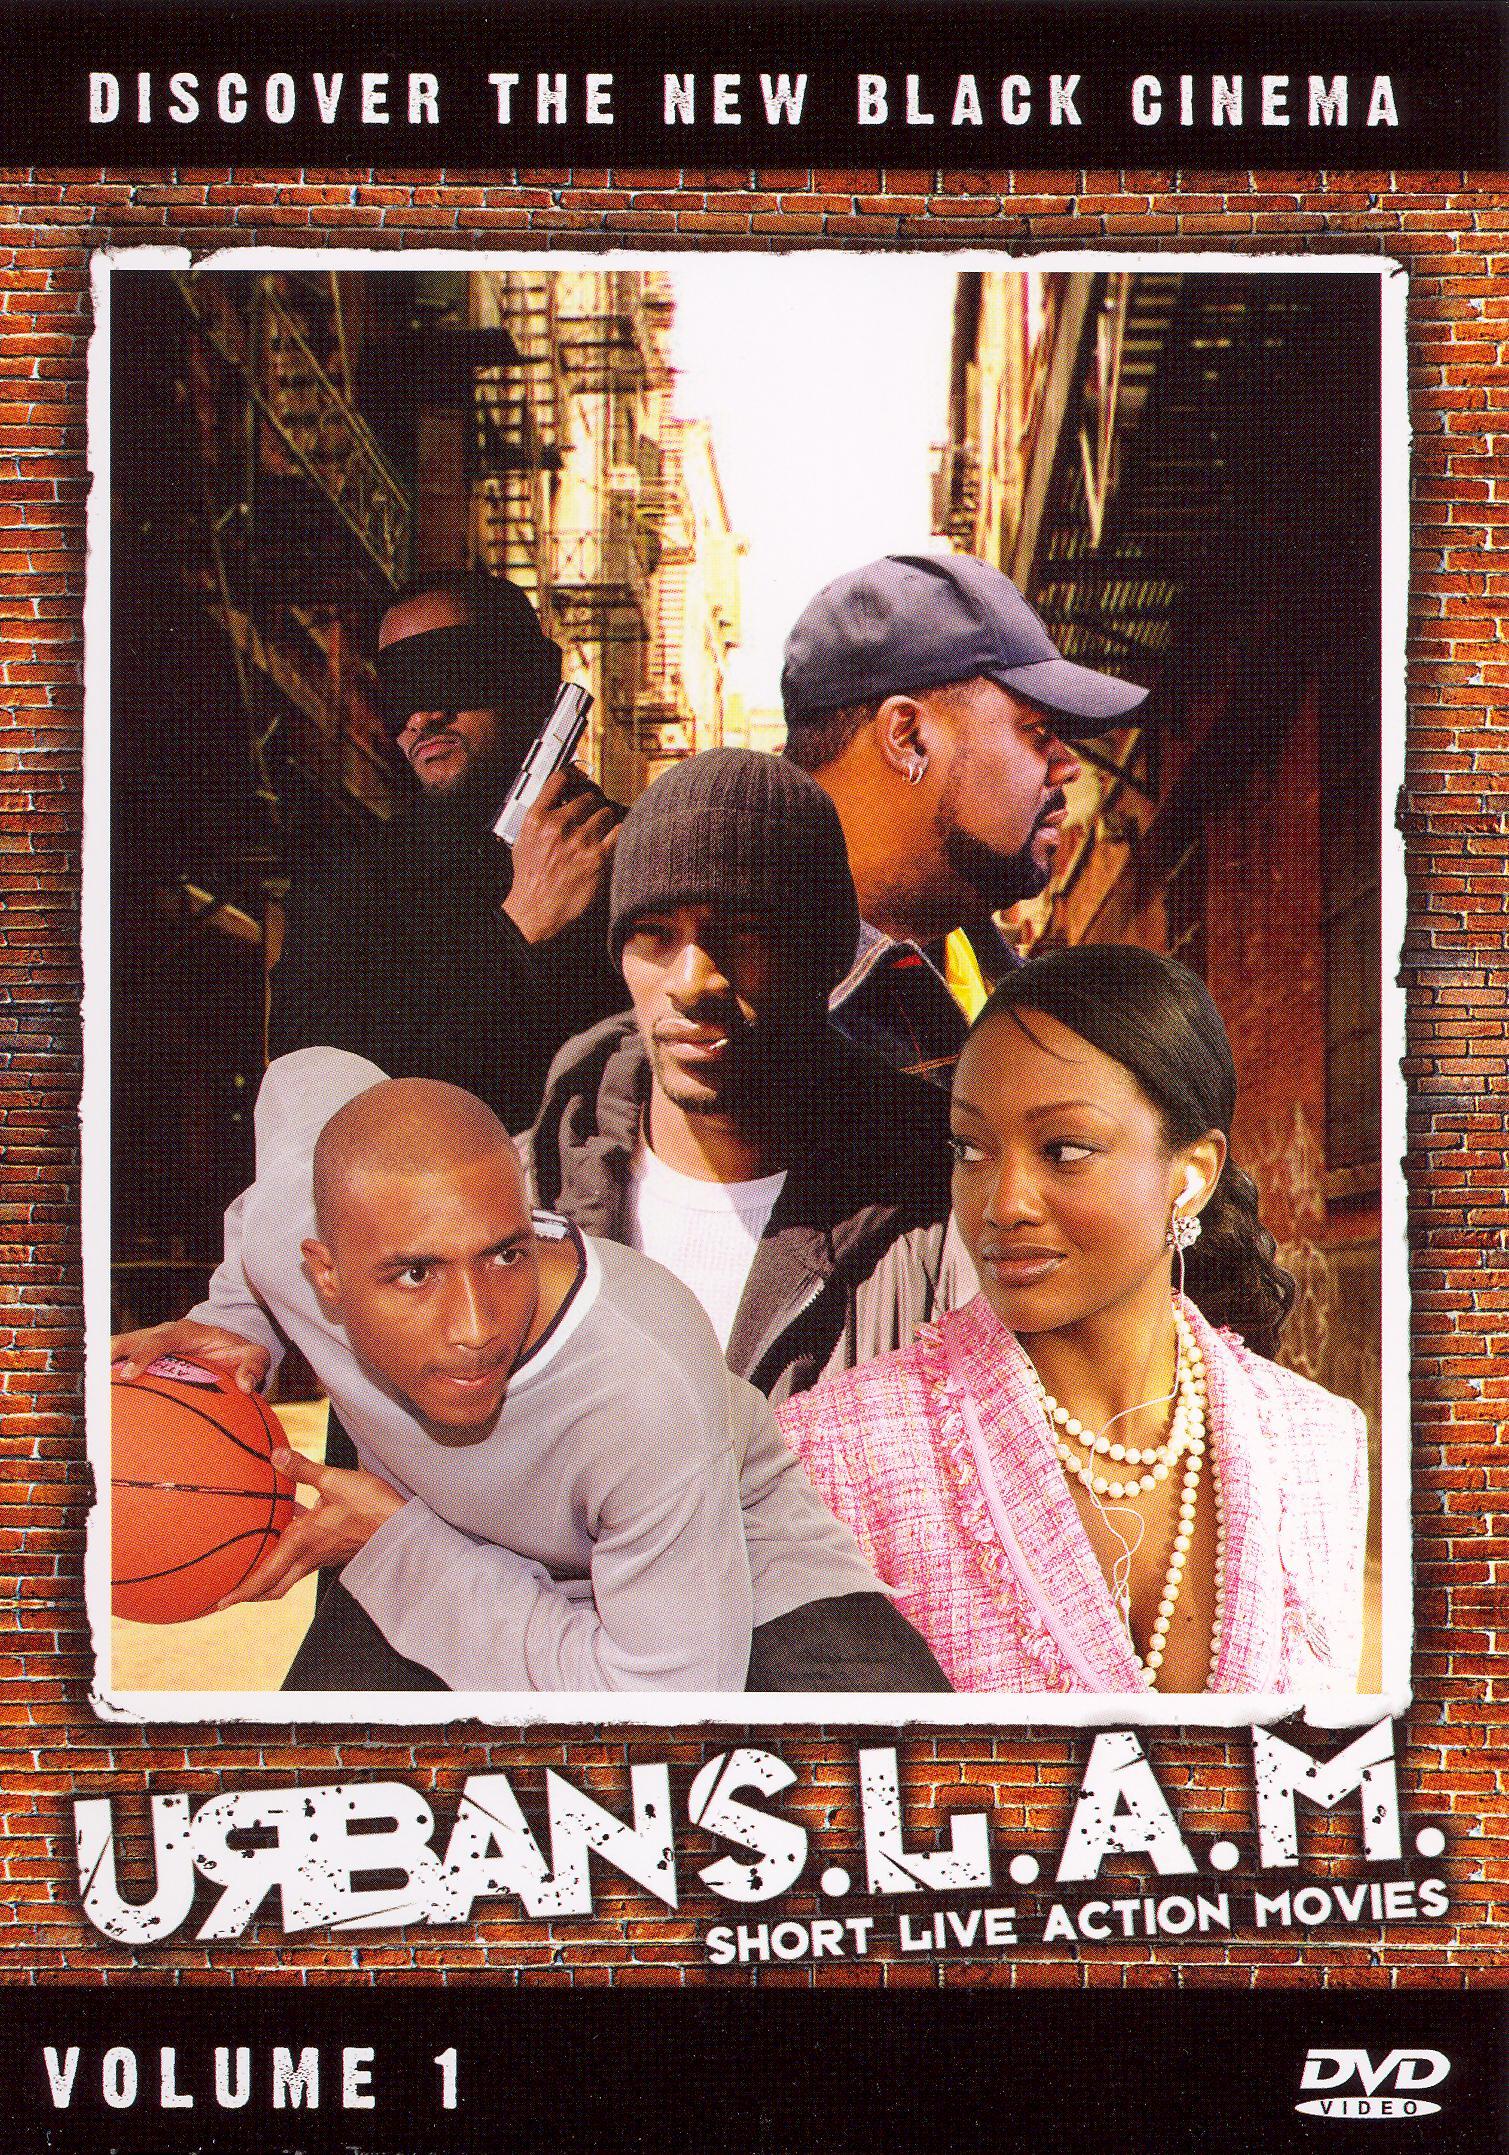 Urban S.L.A.M., Vol. 1